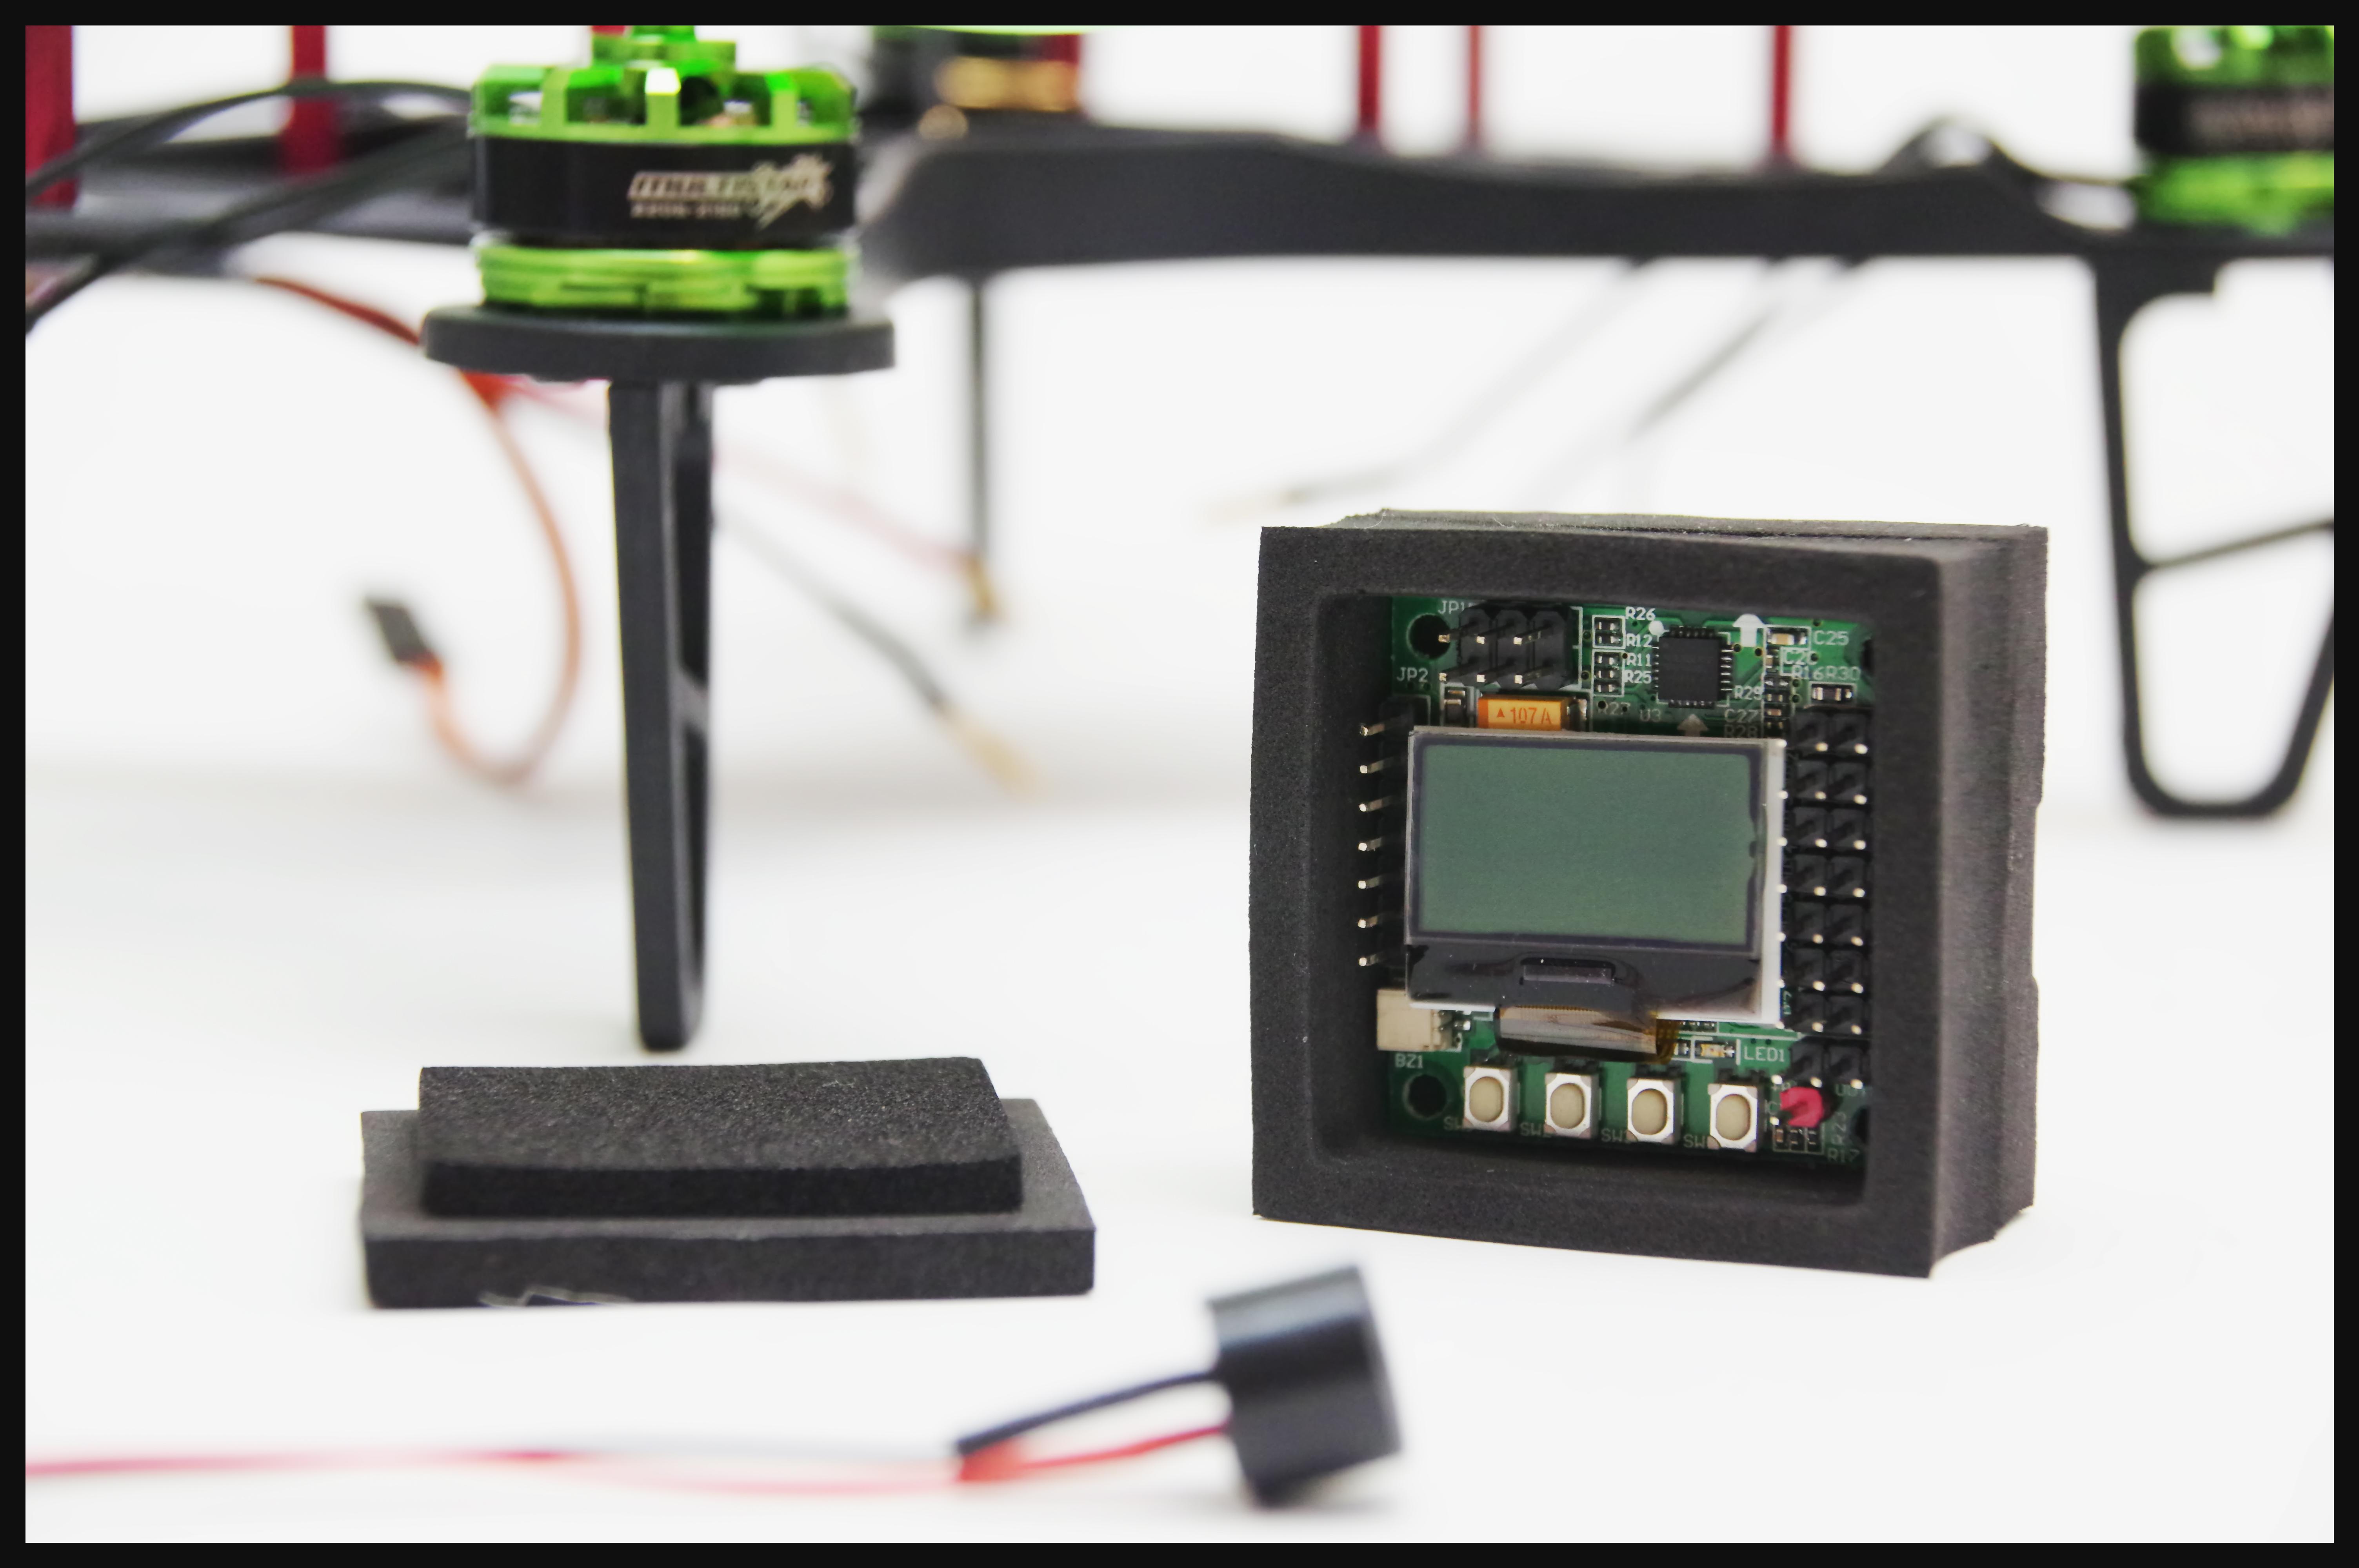 Kk Mini Flight Controller Wiring Reinvent Your Diagram Kk2 1hc Hobby King Multi Rotor Control Board 36x36mm Rh Thedronesmag Com 21